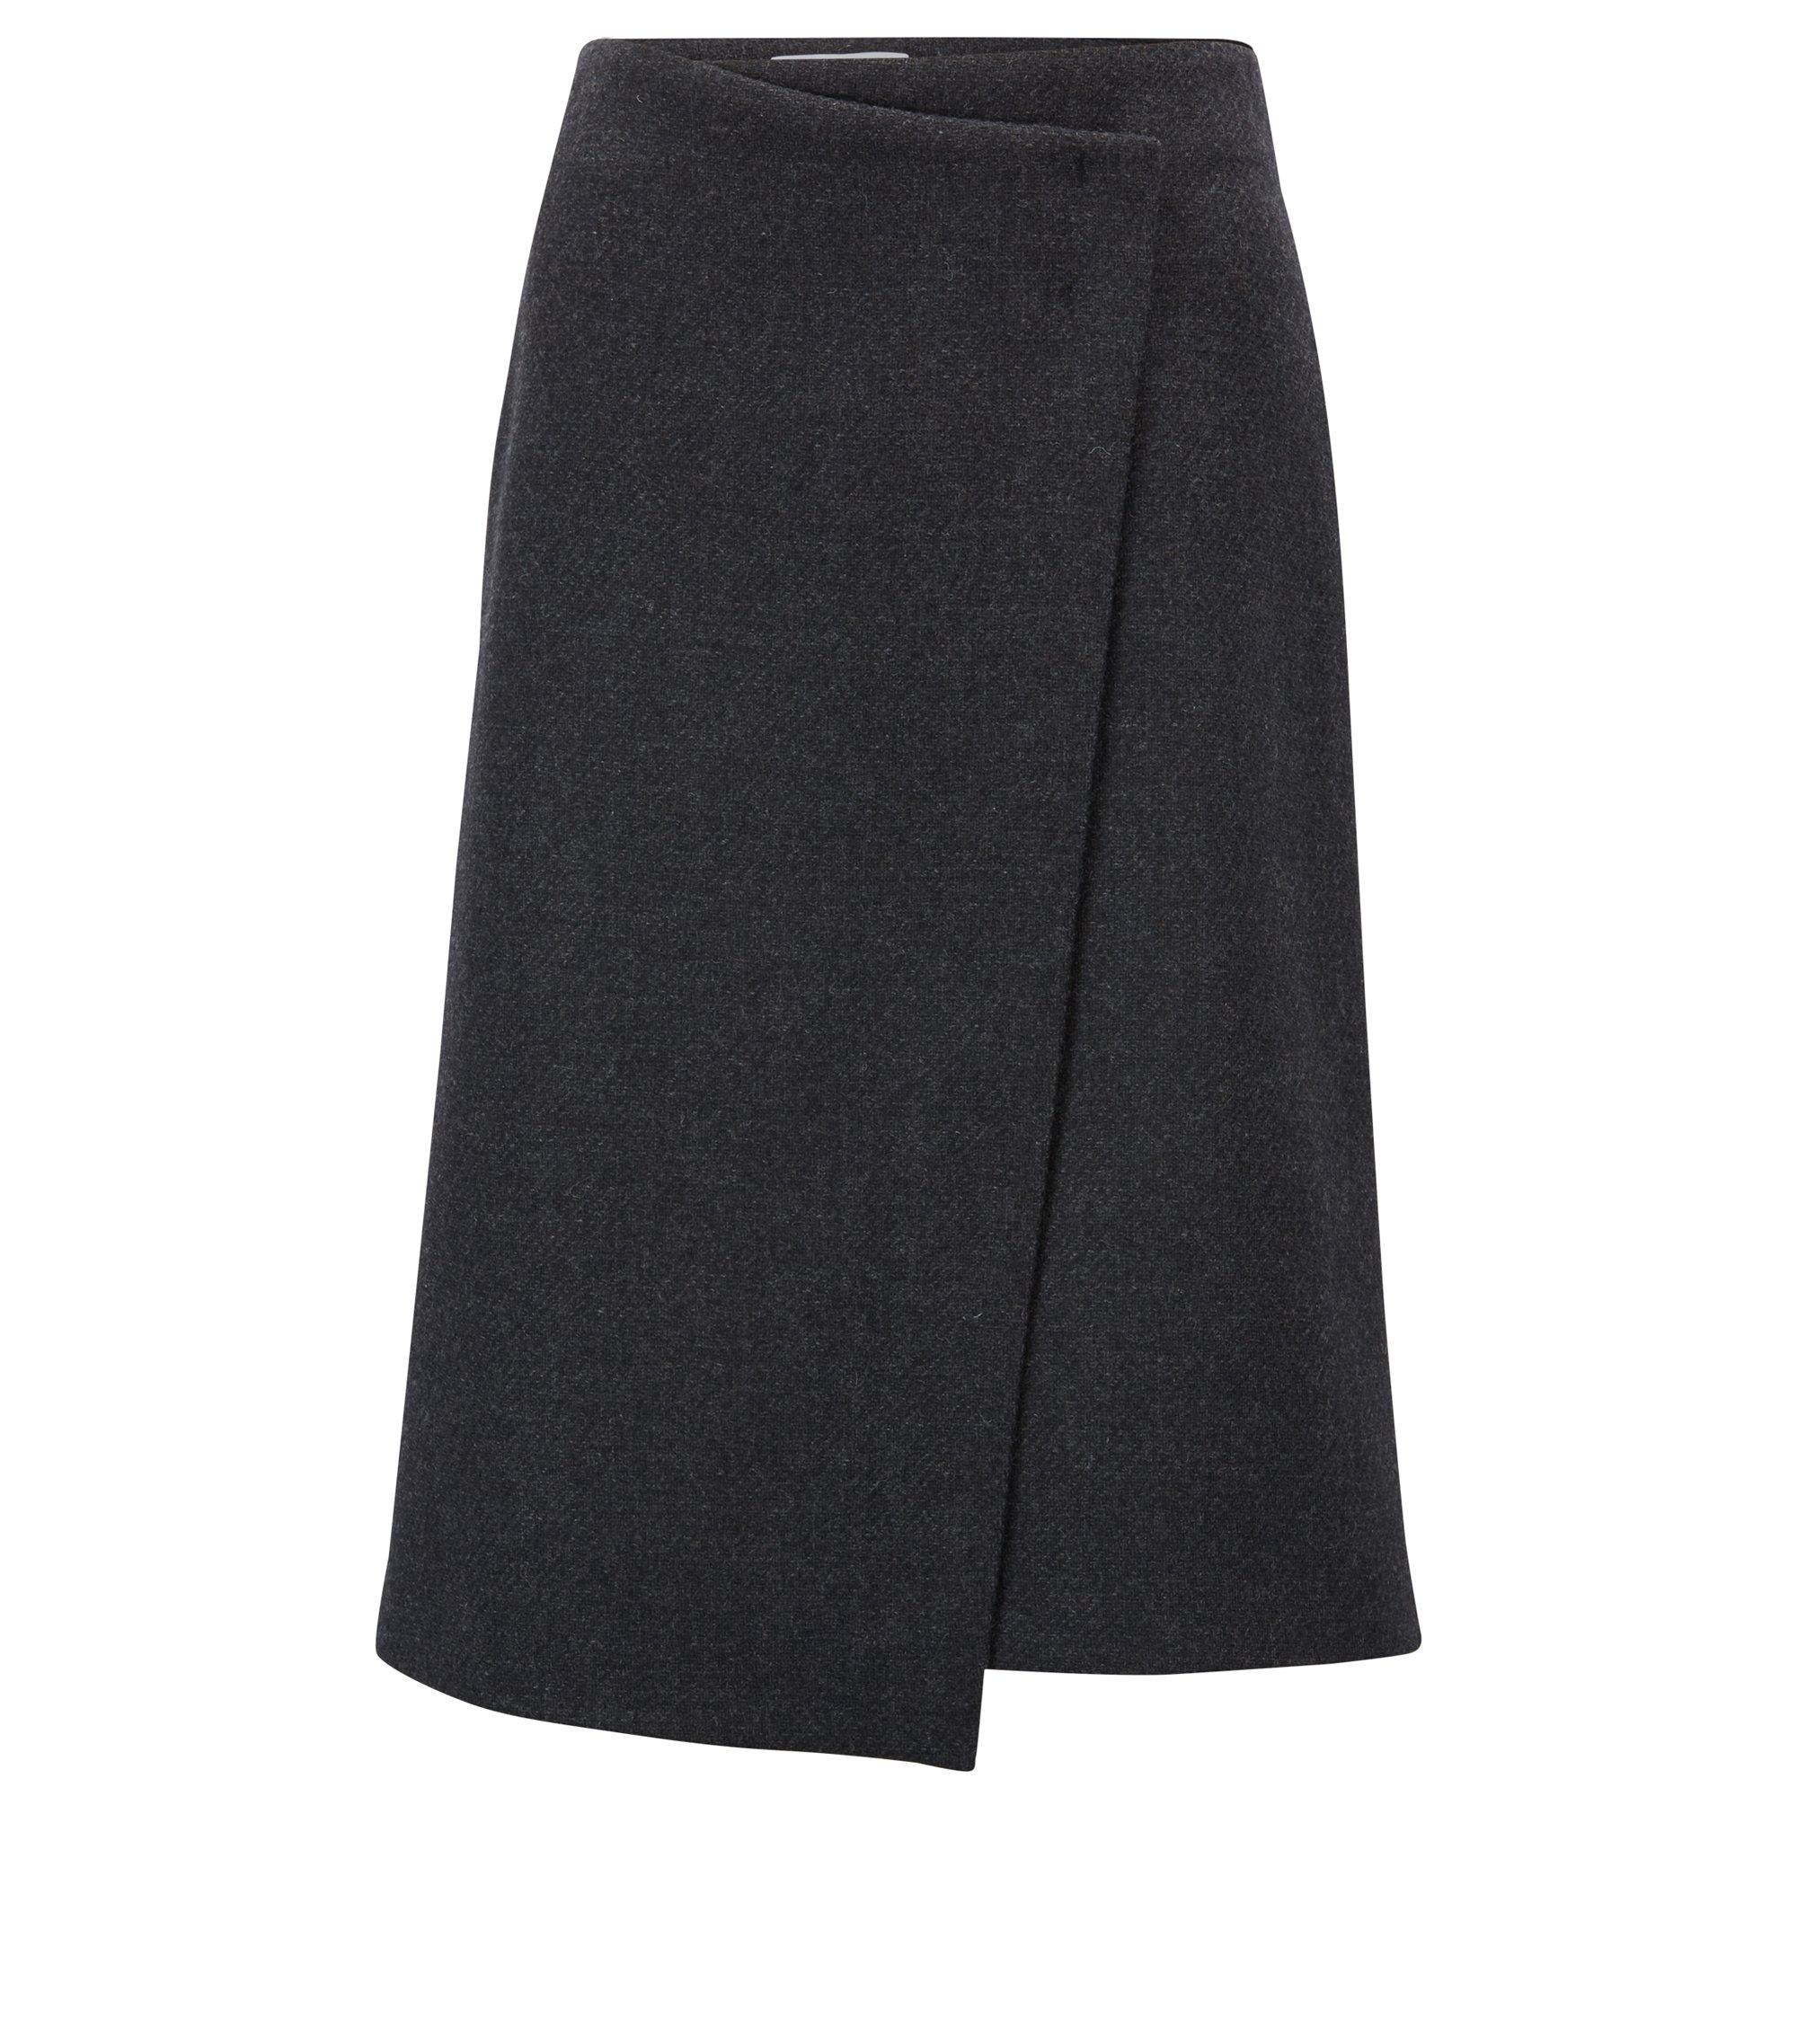 Italian wool-blend wrap skirt with bar-tack detail, Black